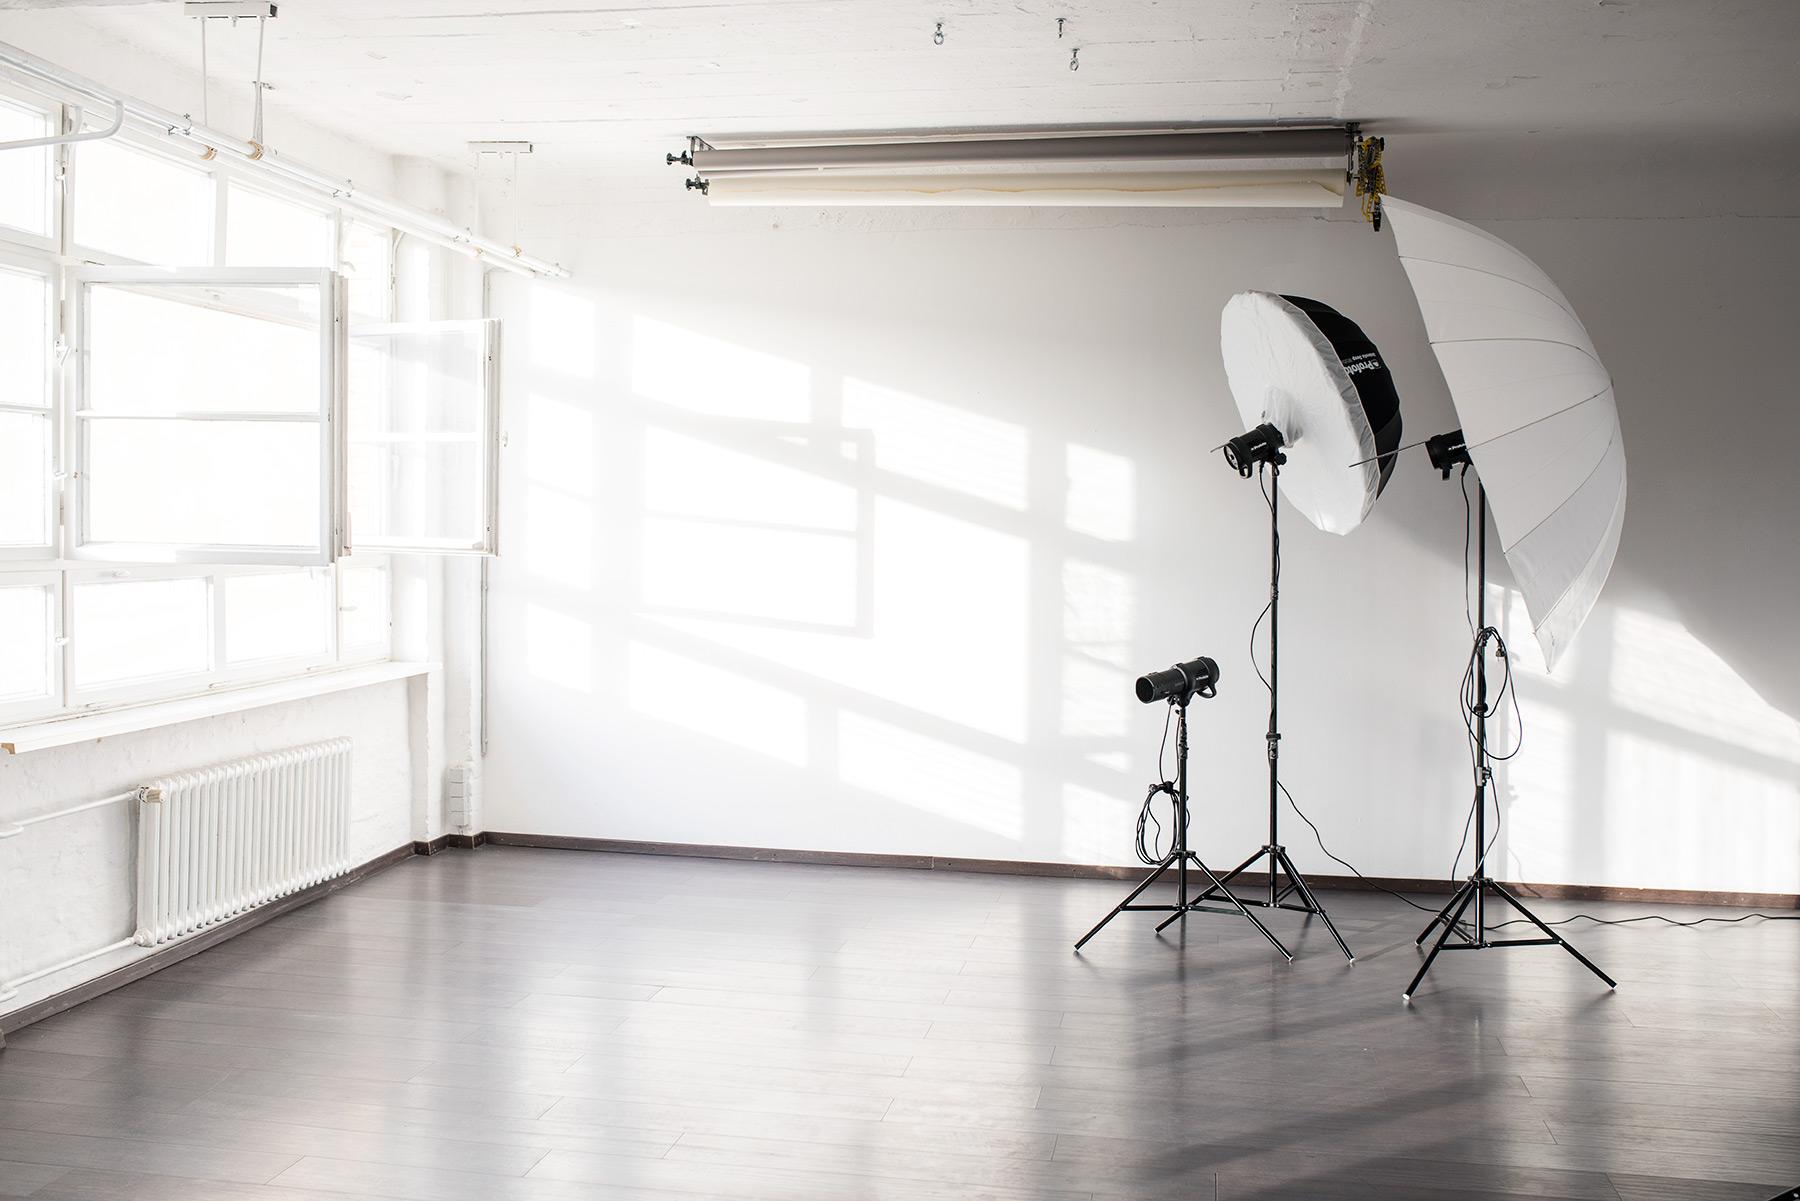 fotomietstudio in berlin ihr tageslicht mietstudio f r foto film casting. Black Bedroom Furniture Sets. Home Design Ideas